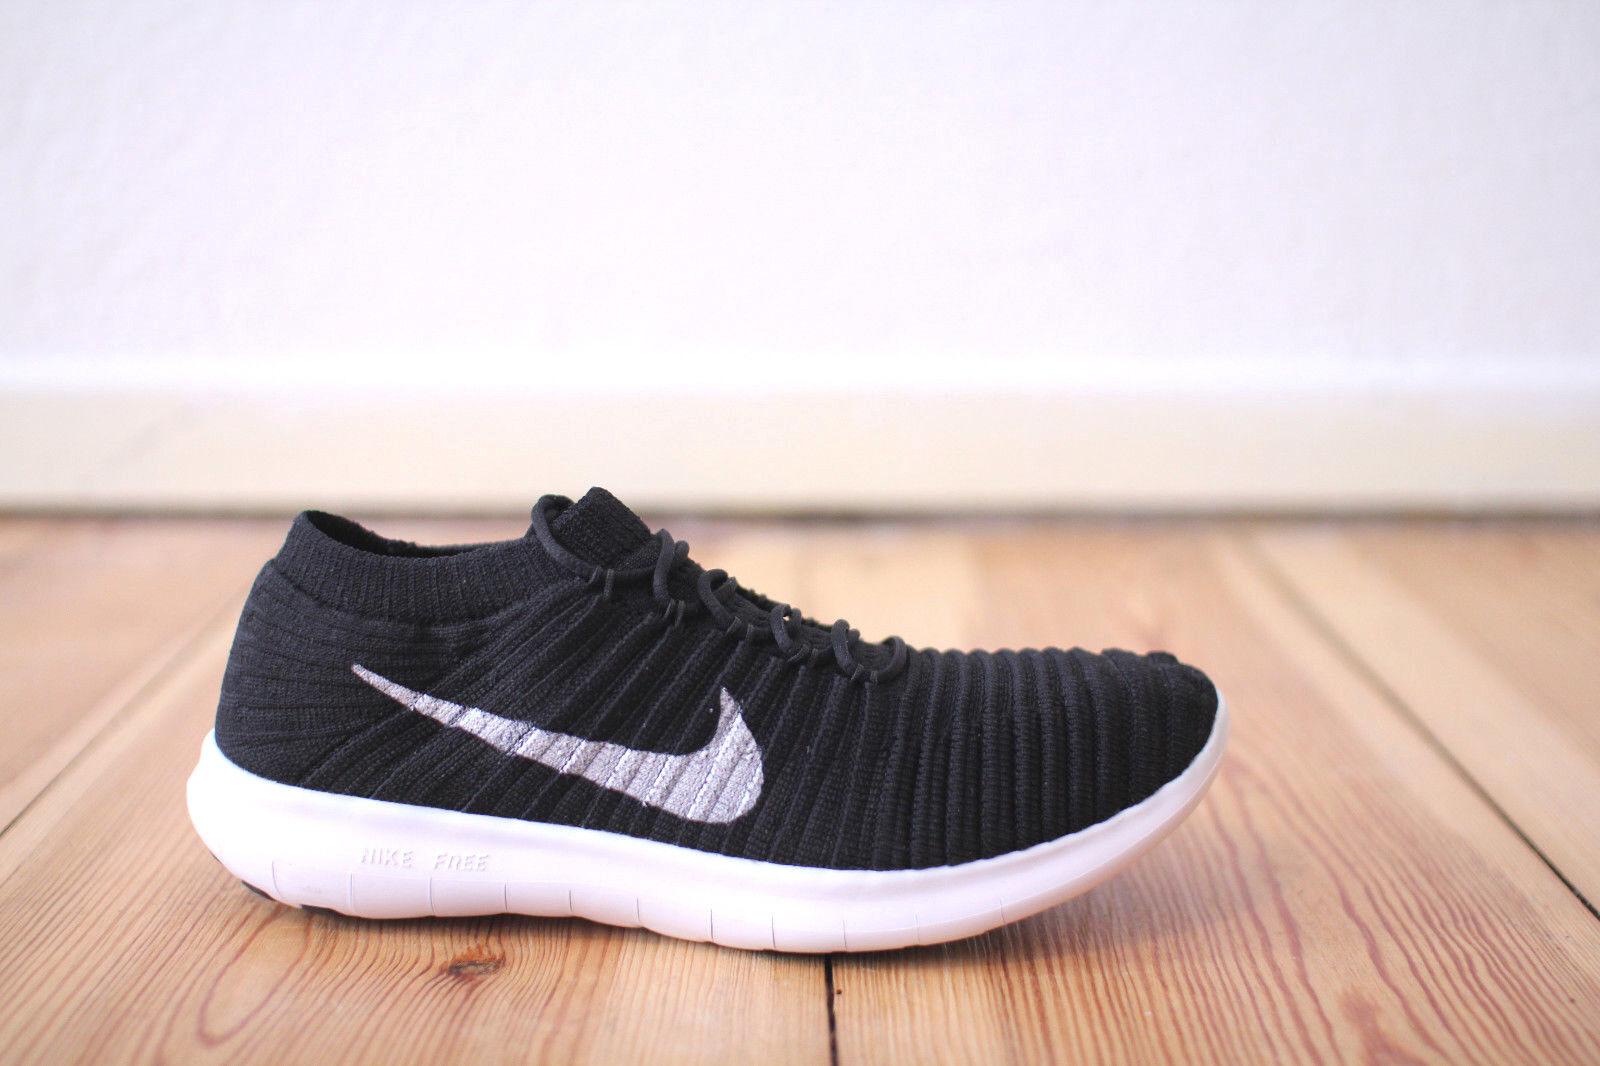 Nike Free RN Flyknit WMNS black white Gr. 38,39,40,41 NEU & OVP